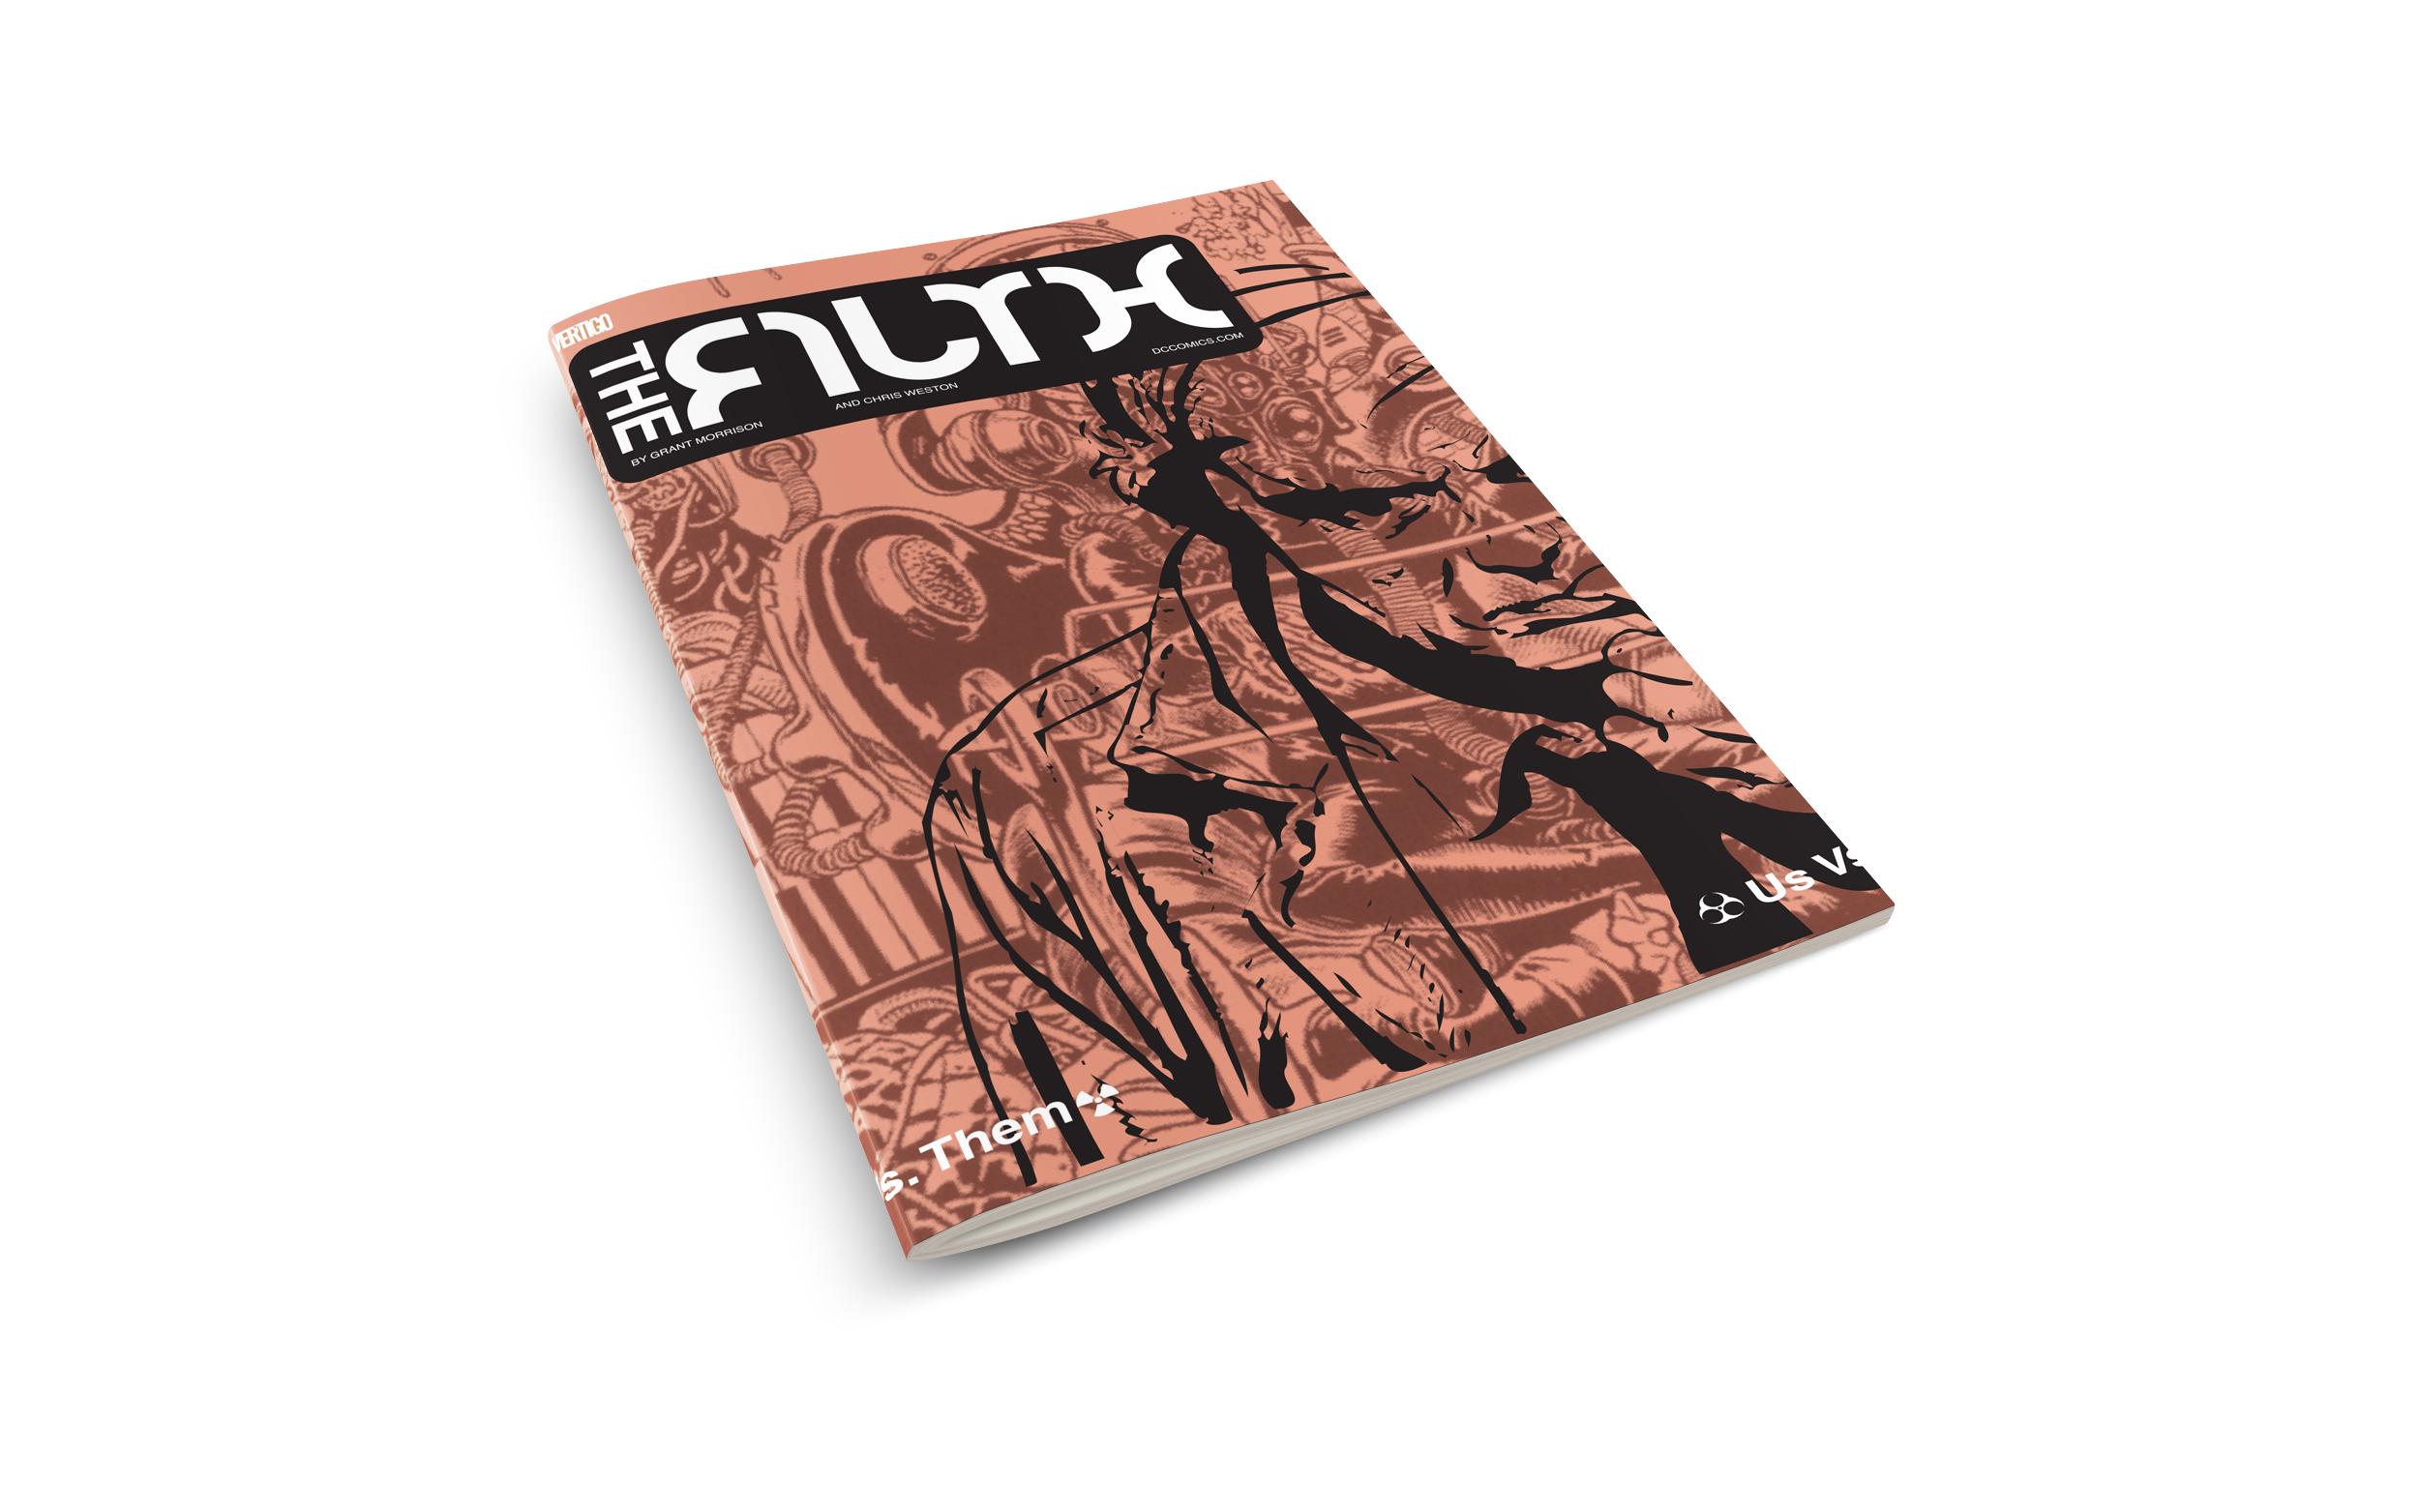 filth_us-vs-them_6_comp_2500w.jpg